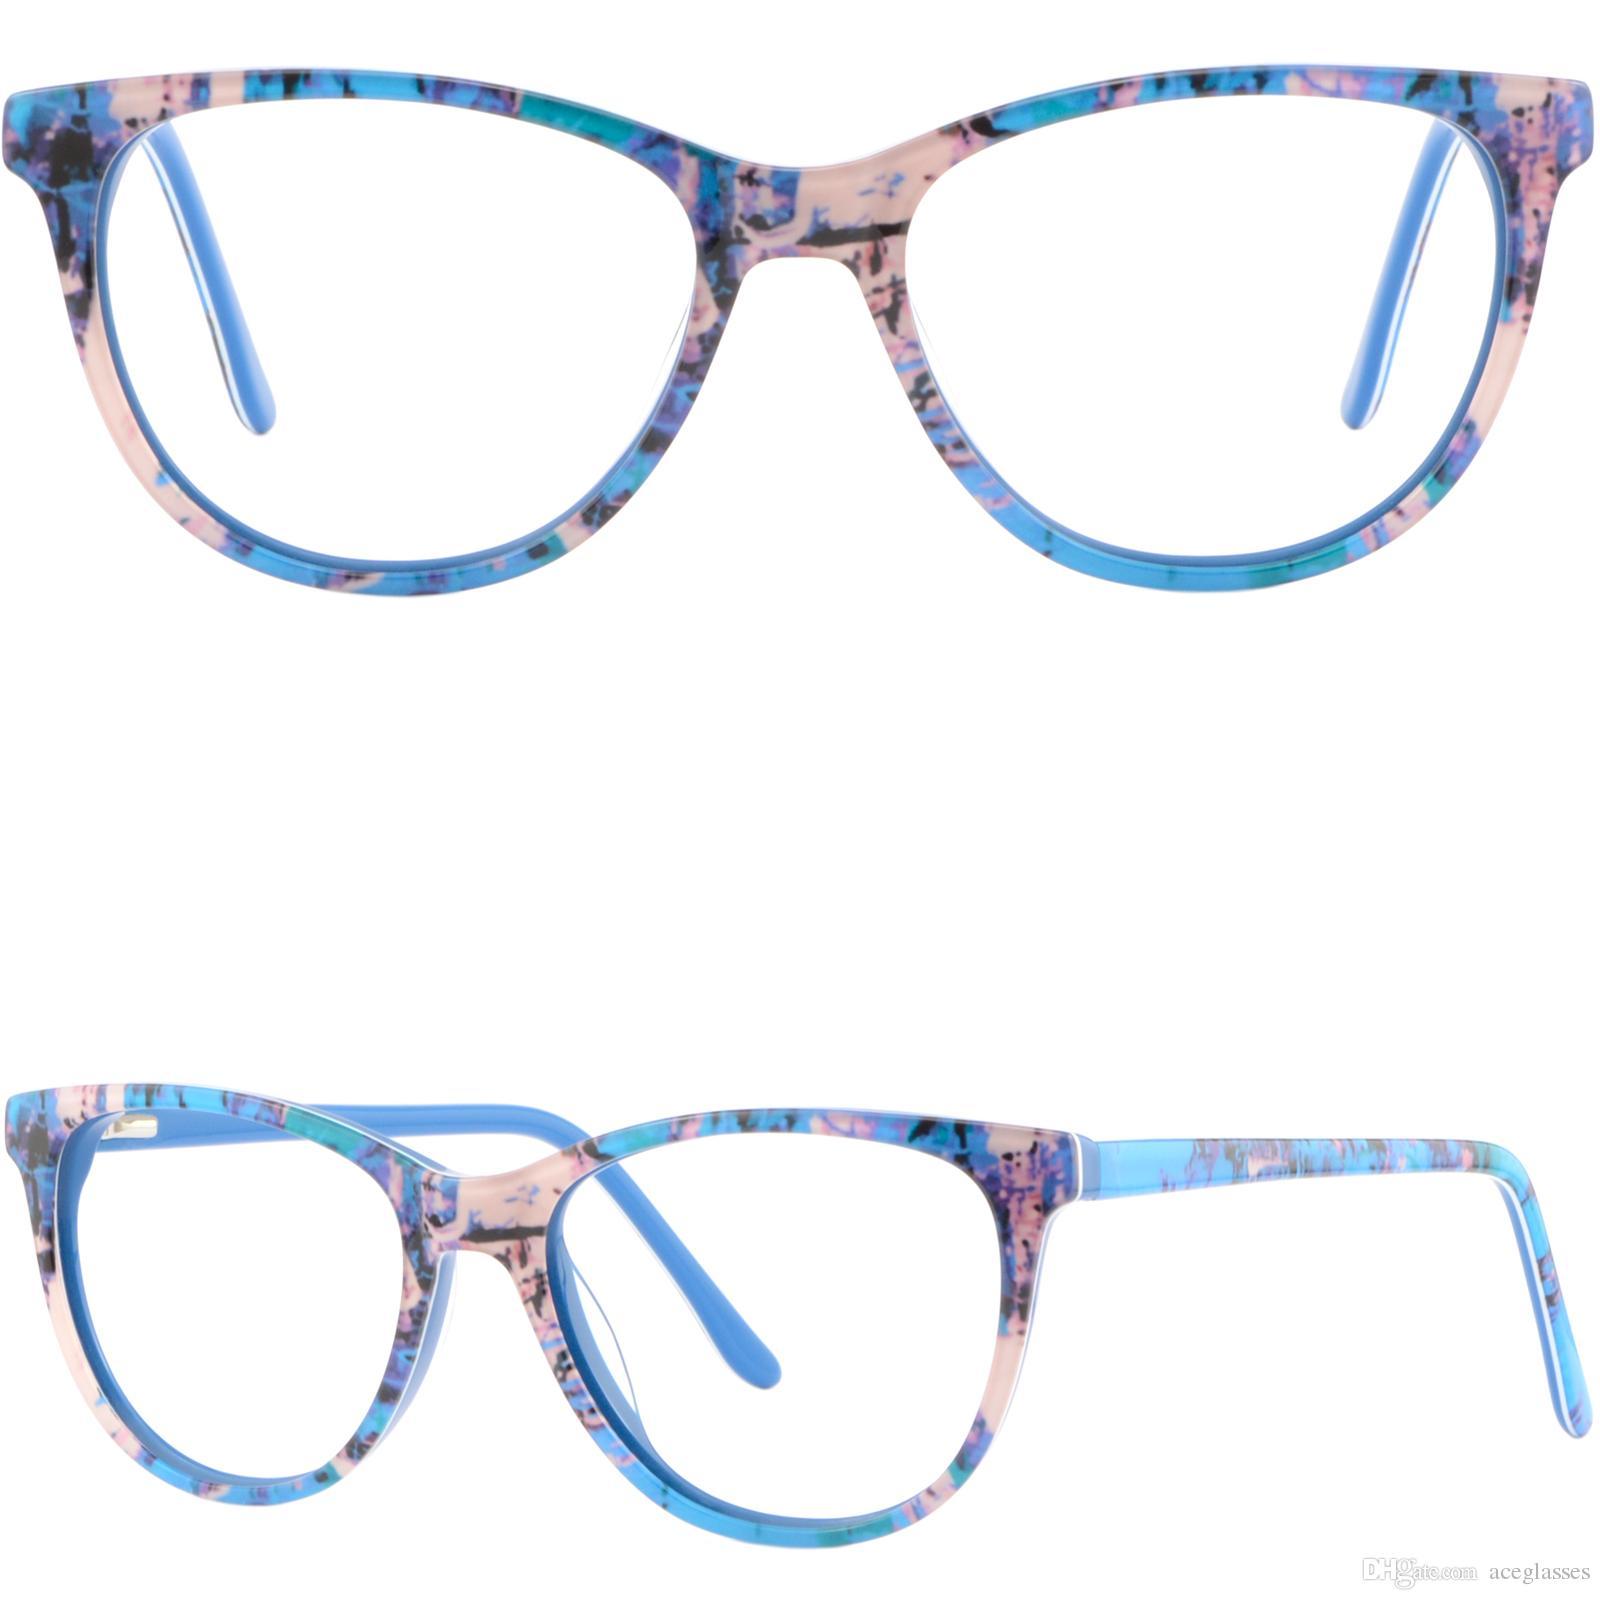 473a8136bb1 Womens Mens Acetate Frames Spring Hinges Prescription Glasses RX Eyeglasses  Blue Glasses Frame Online with  28.69 Piece on Aceglasses s Store